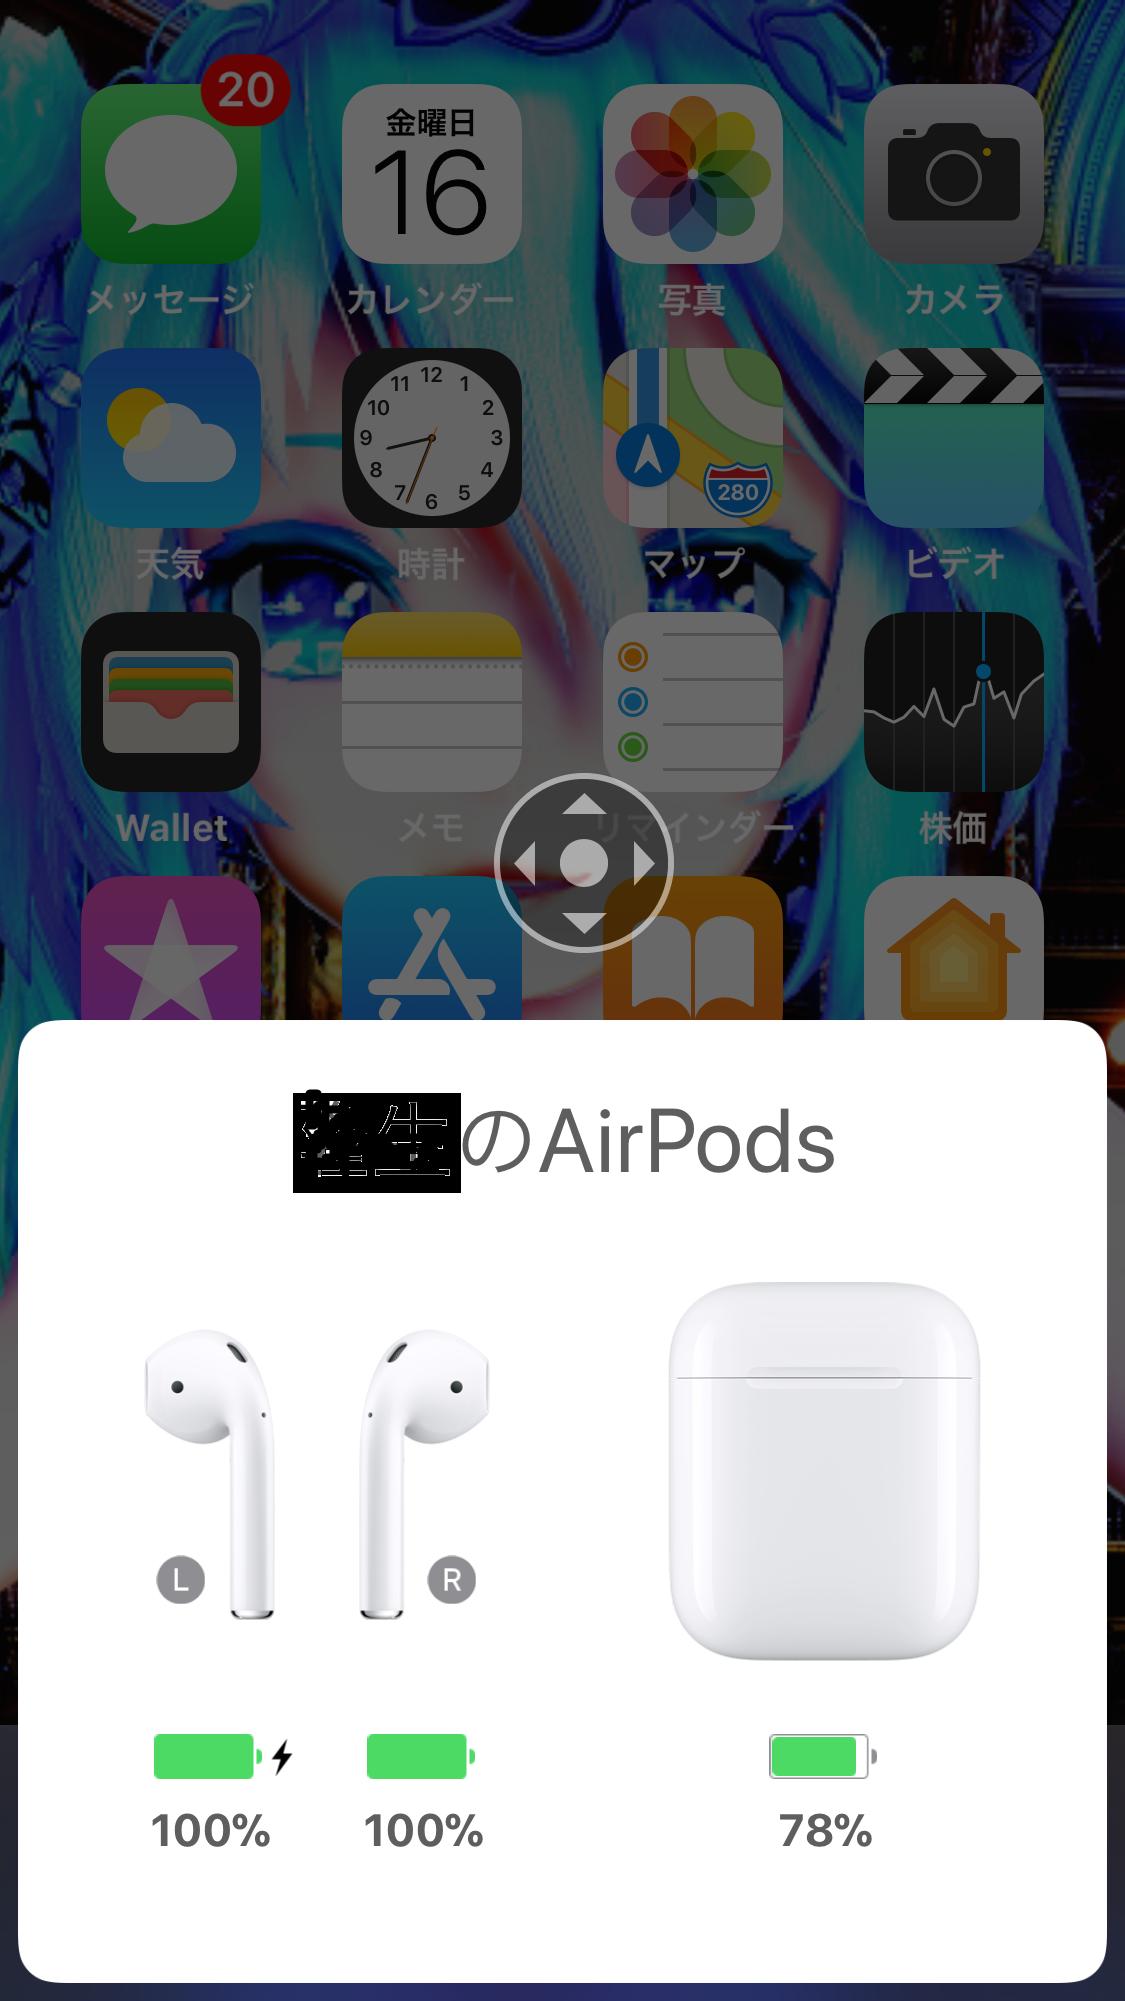 AirPodsのバッテリー残量を確認している画像